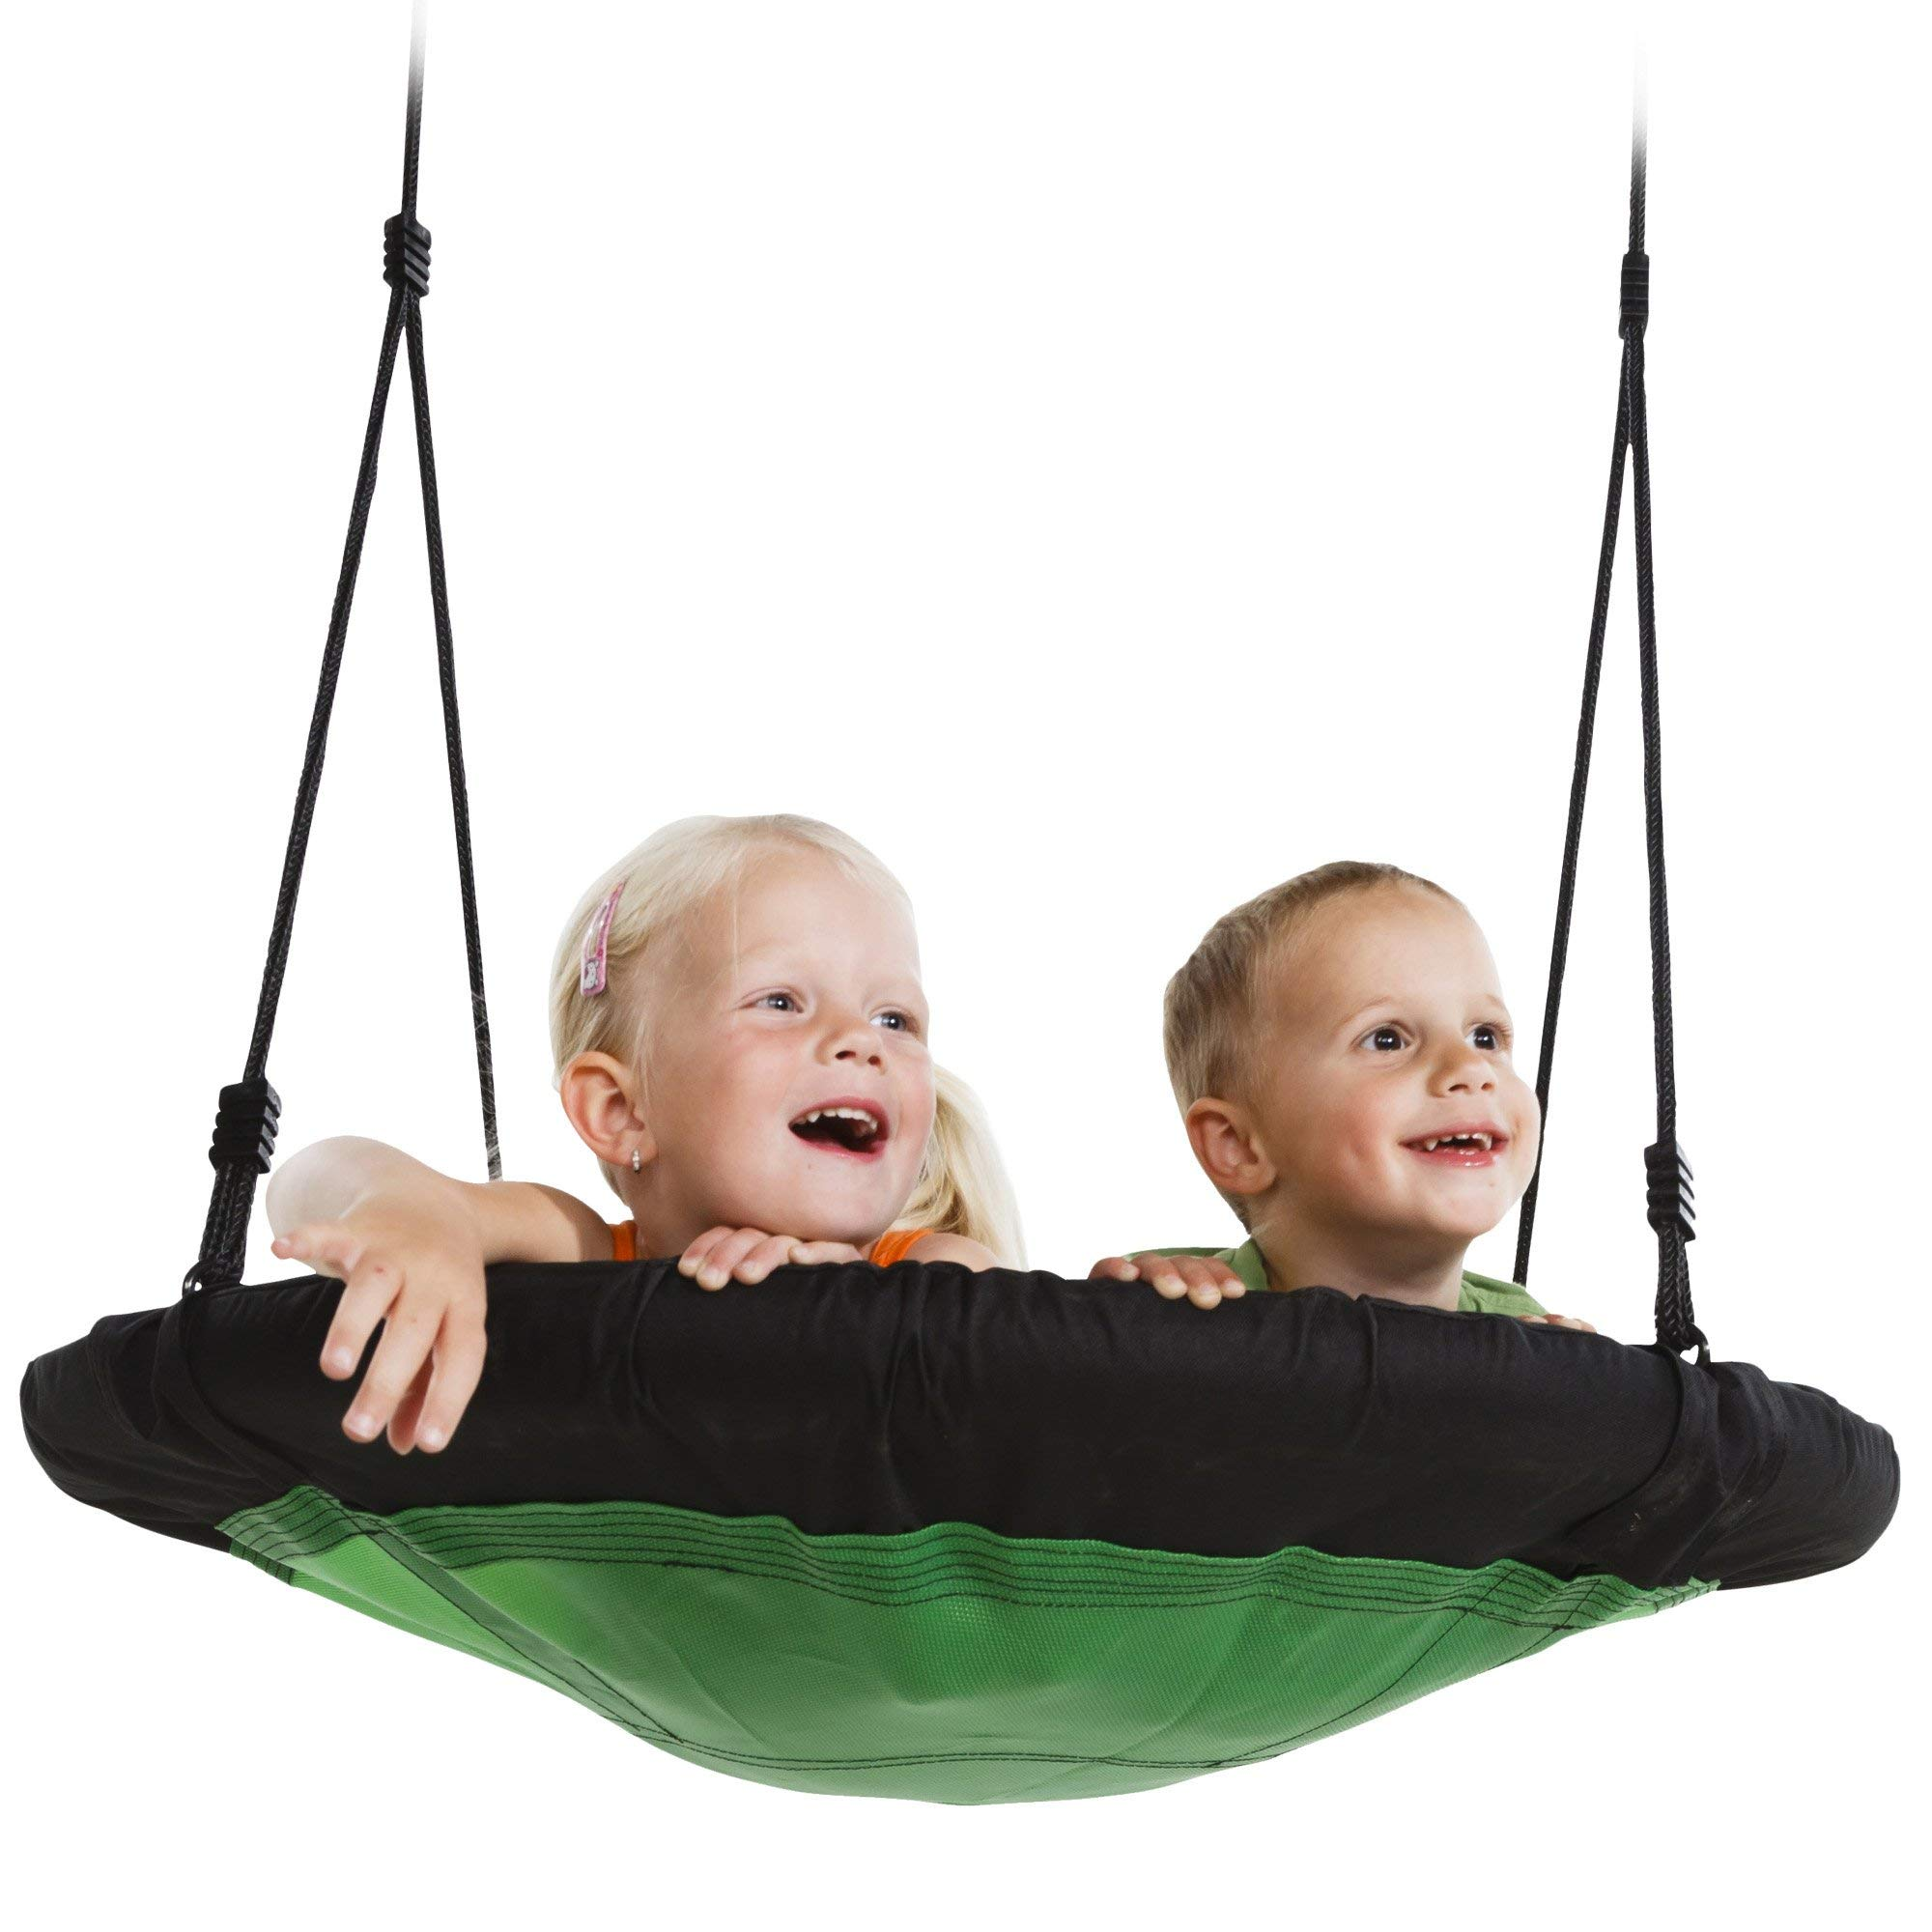 Swing-N-Slide NE 4630 Nest Swing Outdoor Swing with 40'' Diameter, Green & Black (Renewed) by Swing-N-Slide